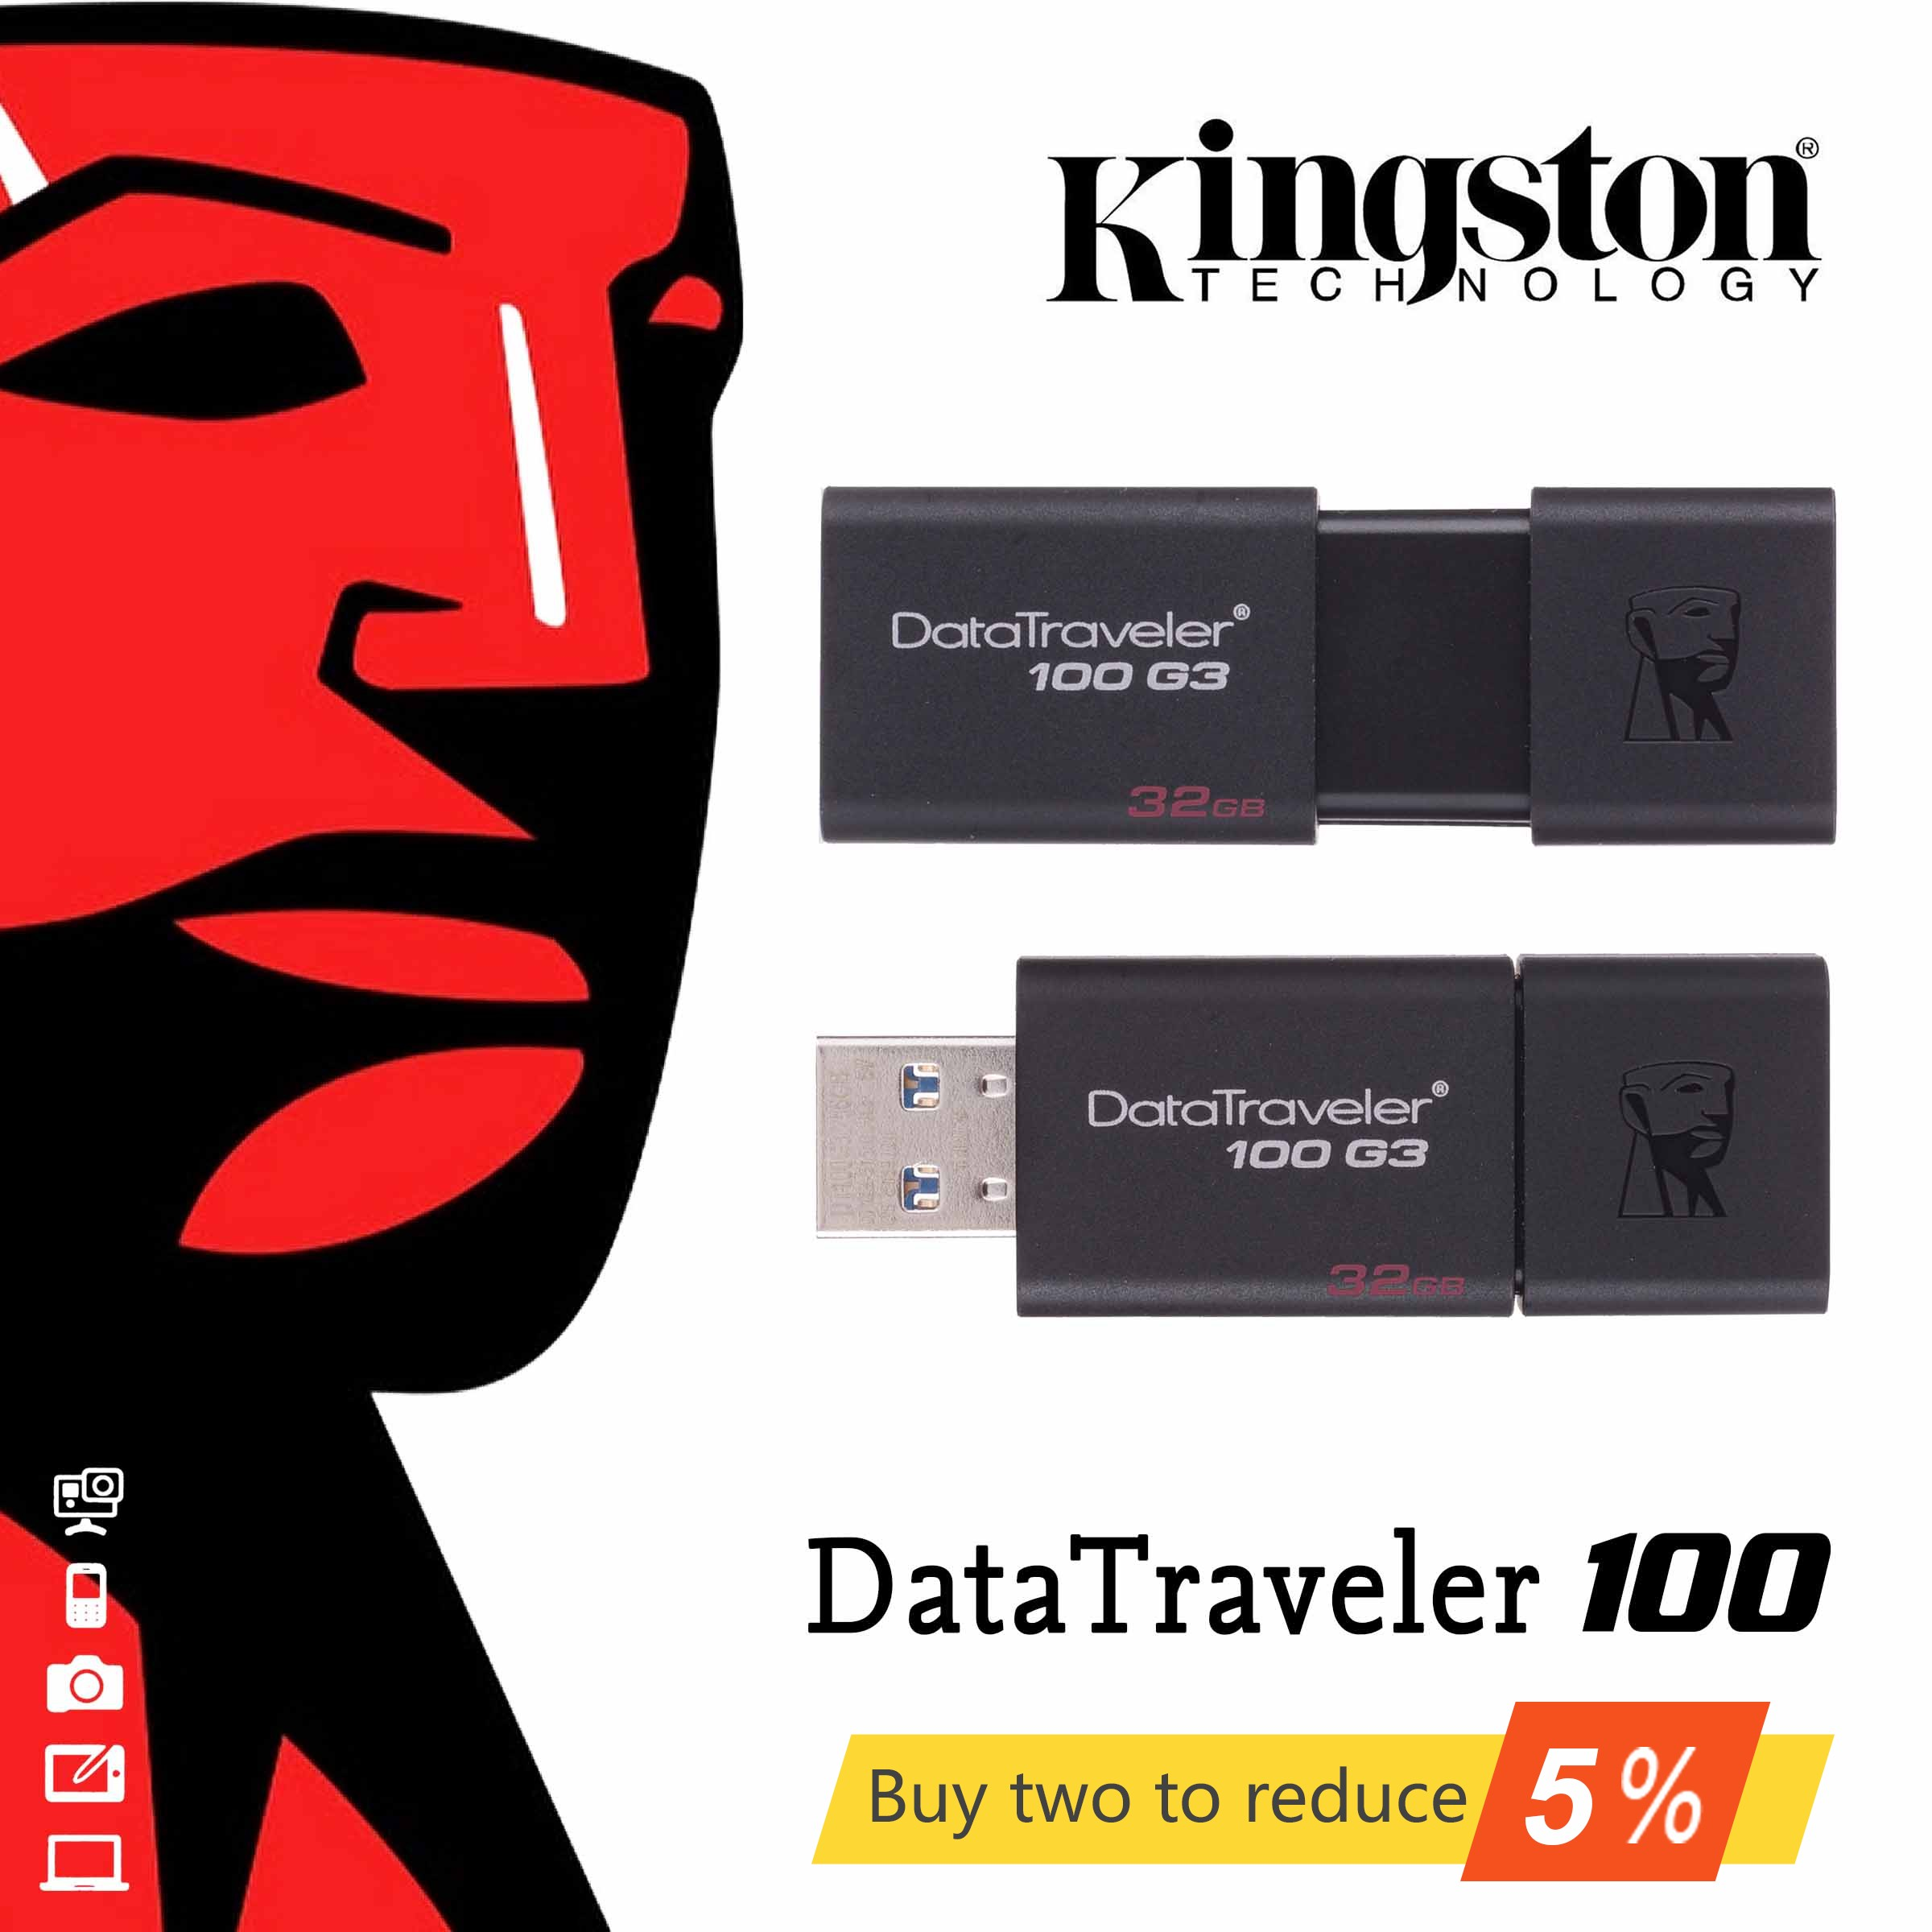 Original Kingston DataTraveler 100 USB 3.0 USB Flash Drive GB 64 32 G3 GB 128 GB USB Pen Drive U disco 32 64 DT100G3 PenDrive de 128 GB